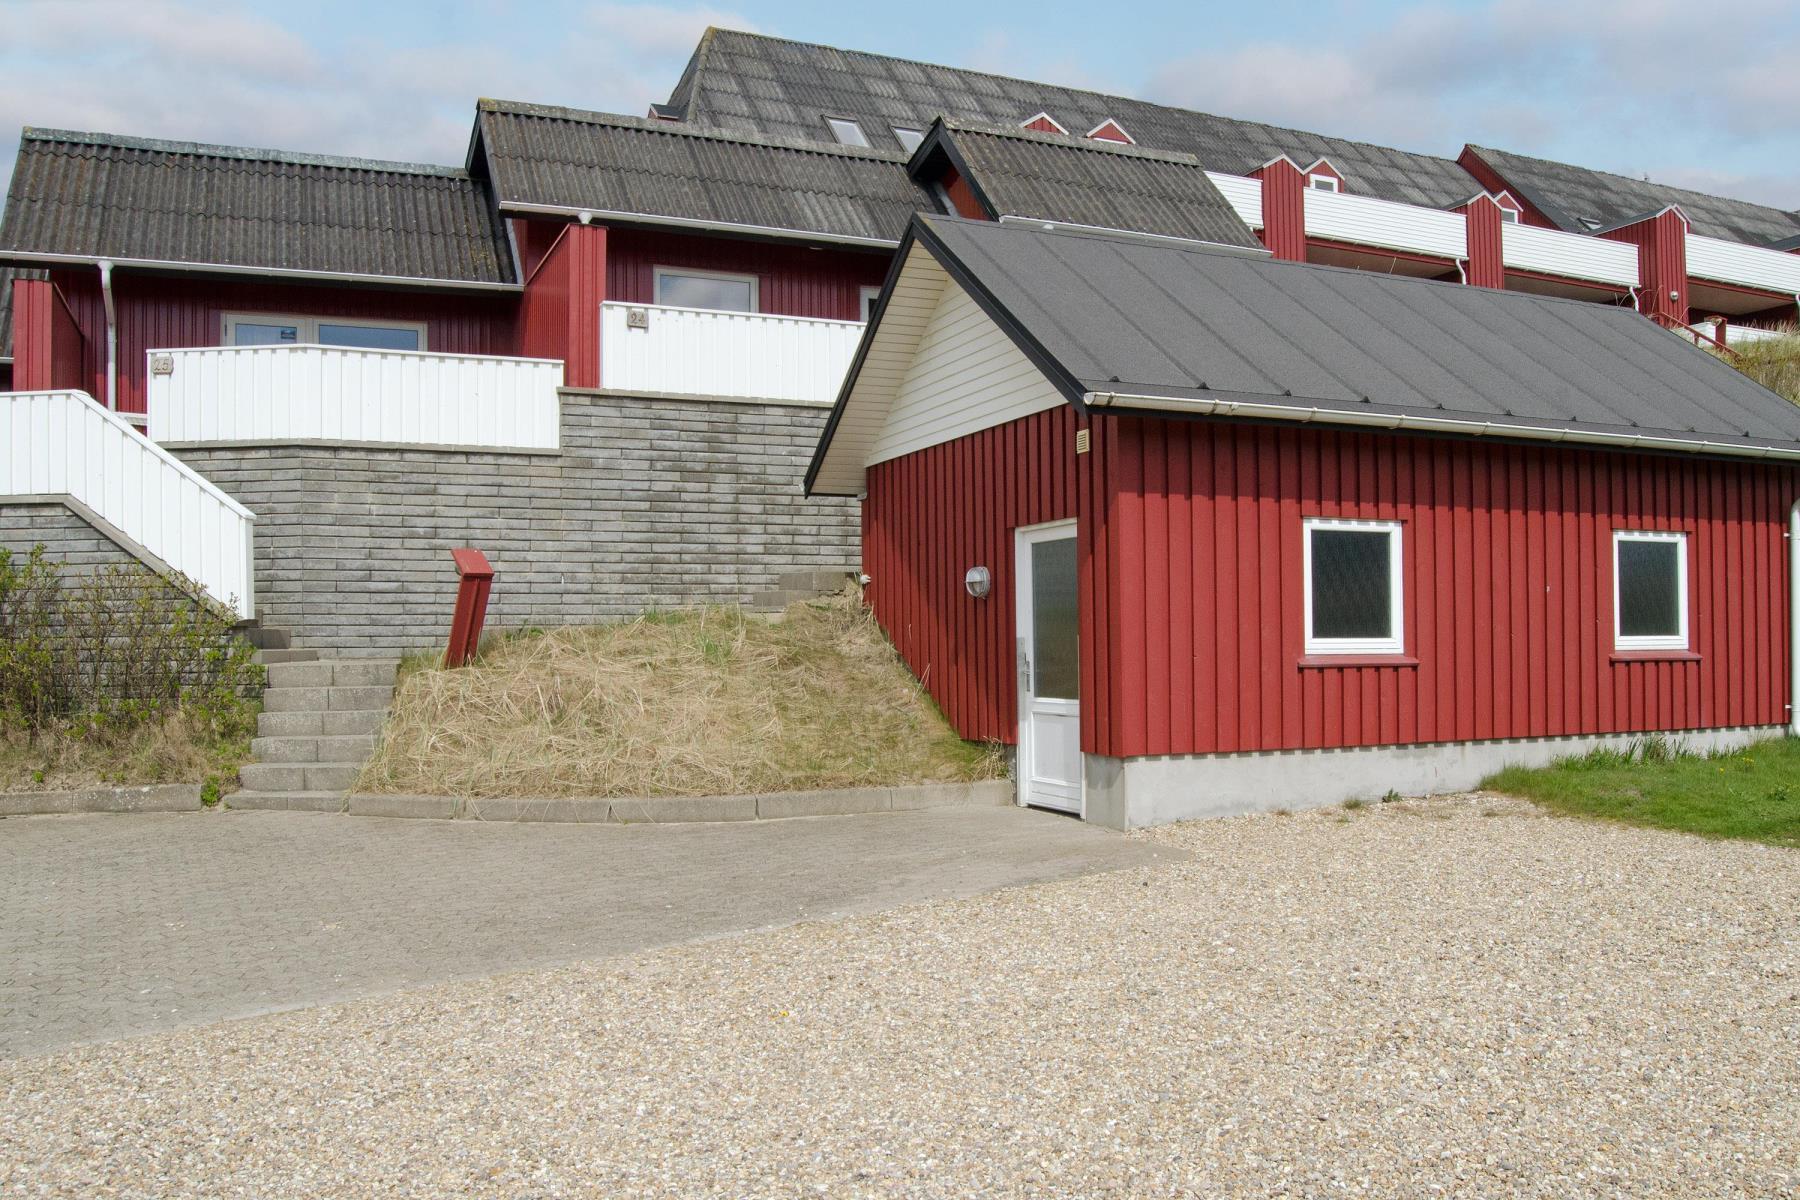 Ferienhaus 1015 - Hjelmevej 15, App. 15